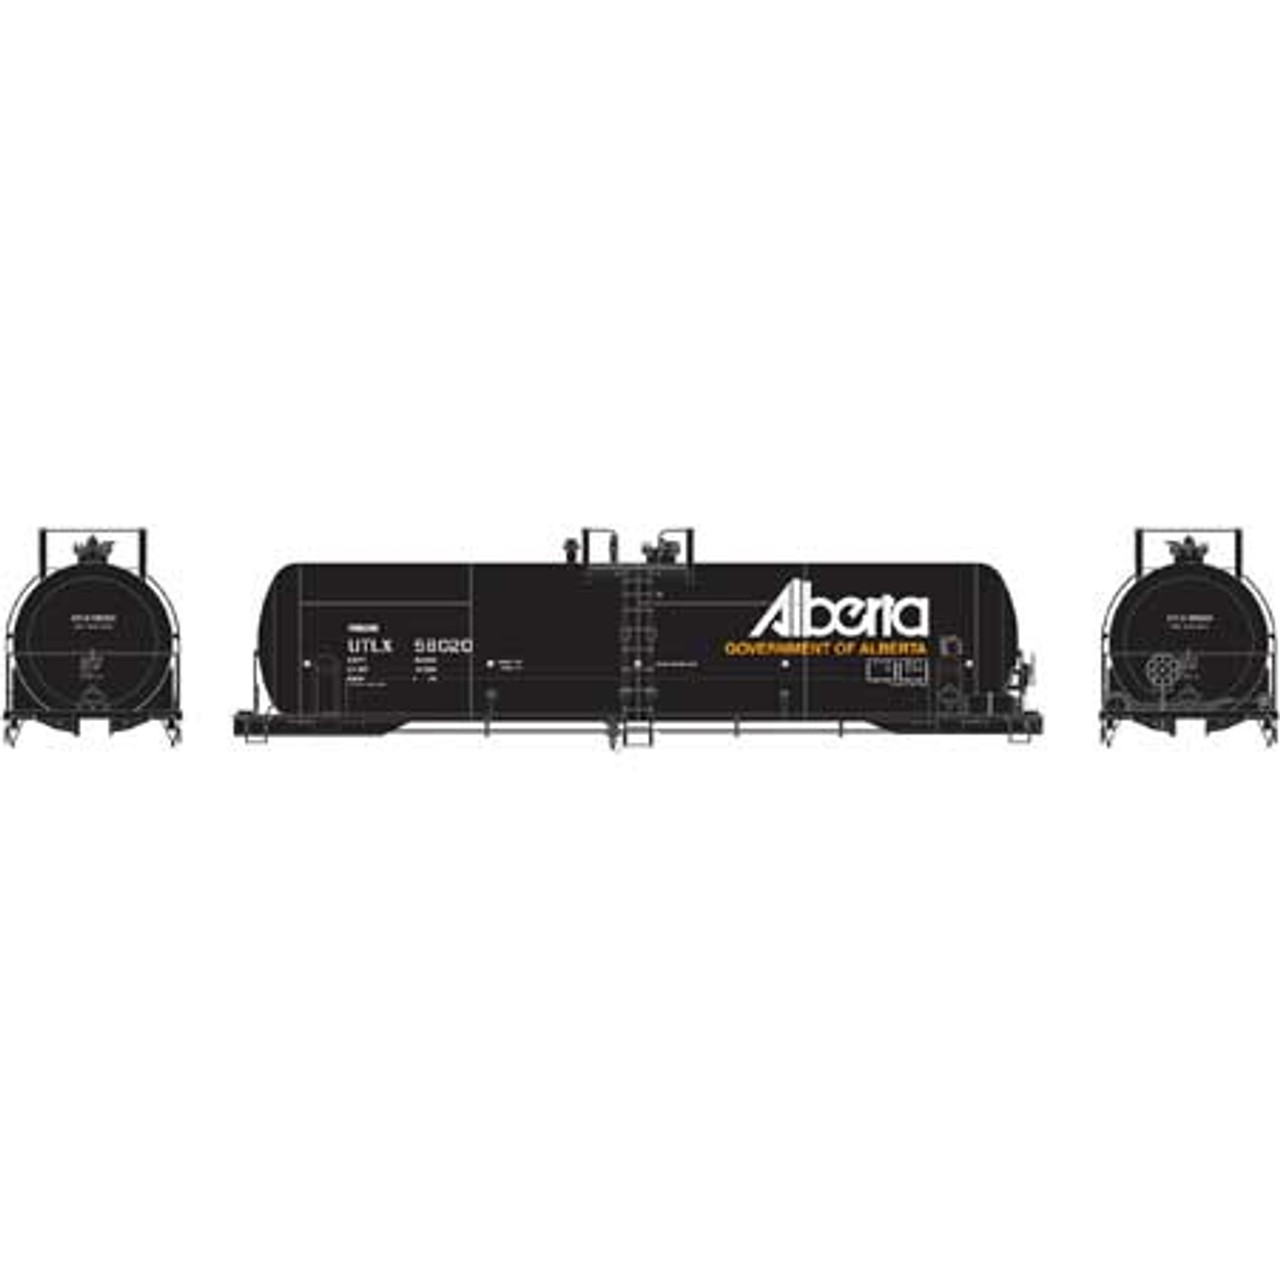 Athearn ATH15775 RTC 20K Tank Car ULTX - Alberta #58020  (Scale =HO) Part #ATH15775